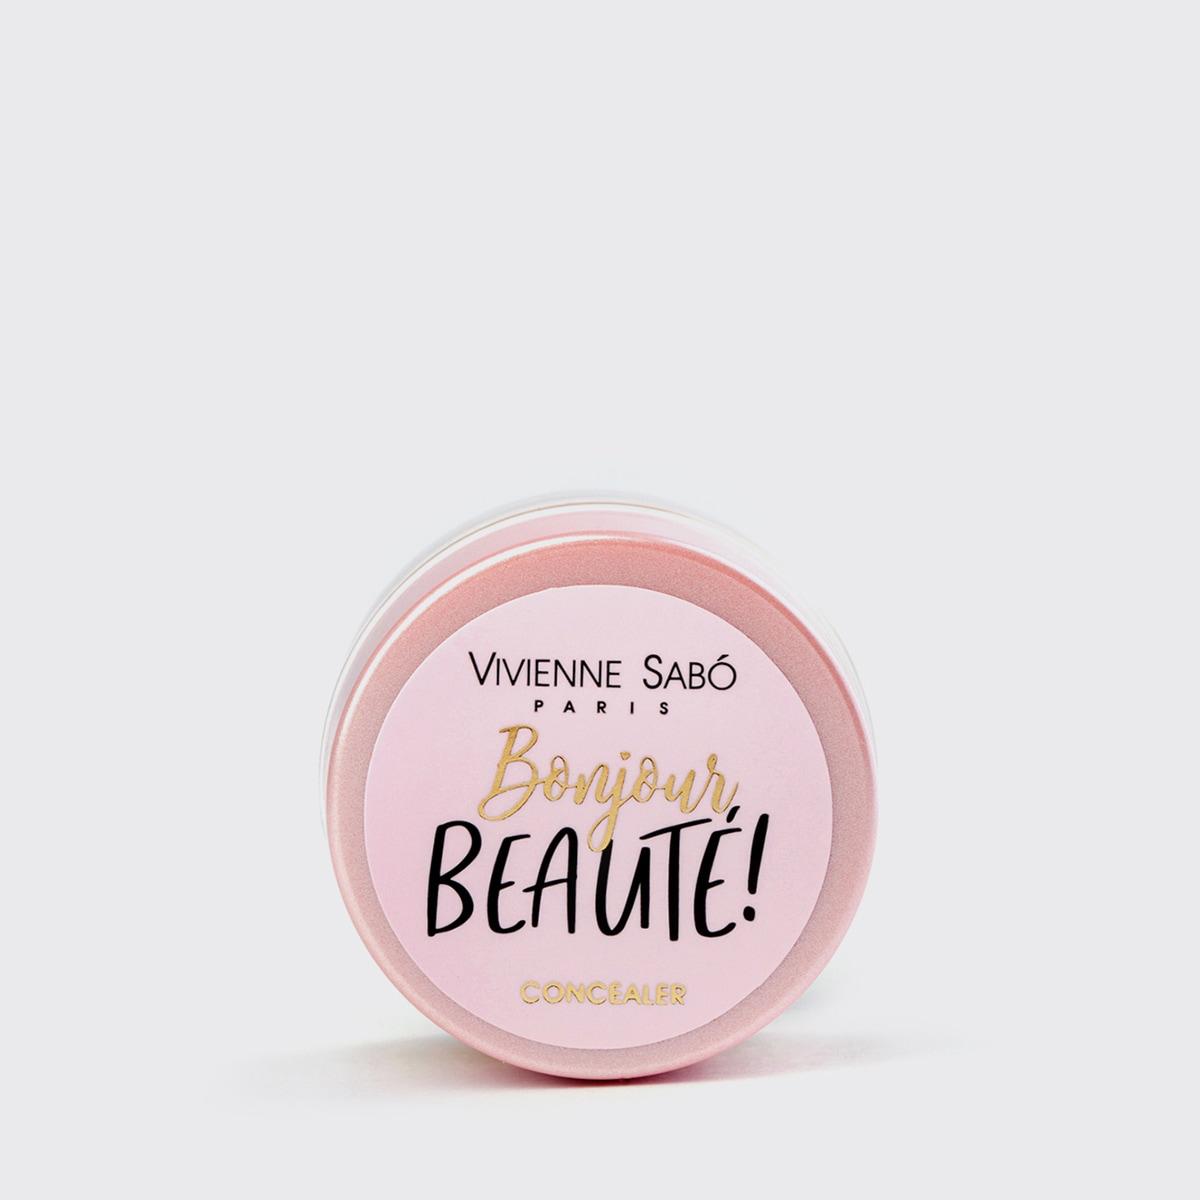 Vivienne Sabo - Concealer Bounjour Beaute 02 - Beige